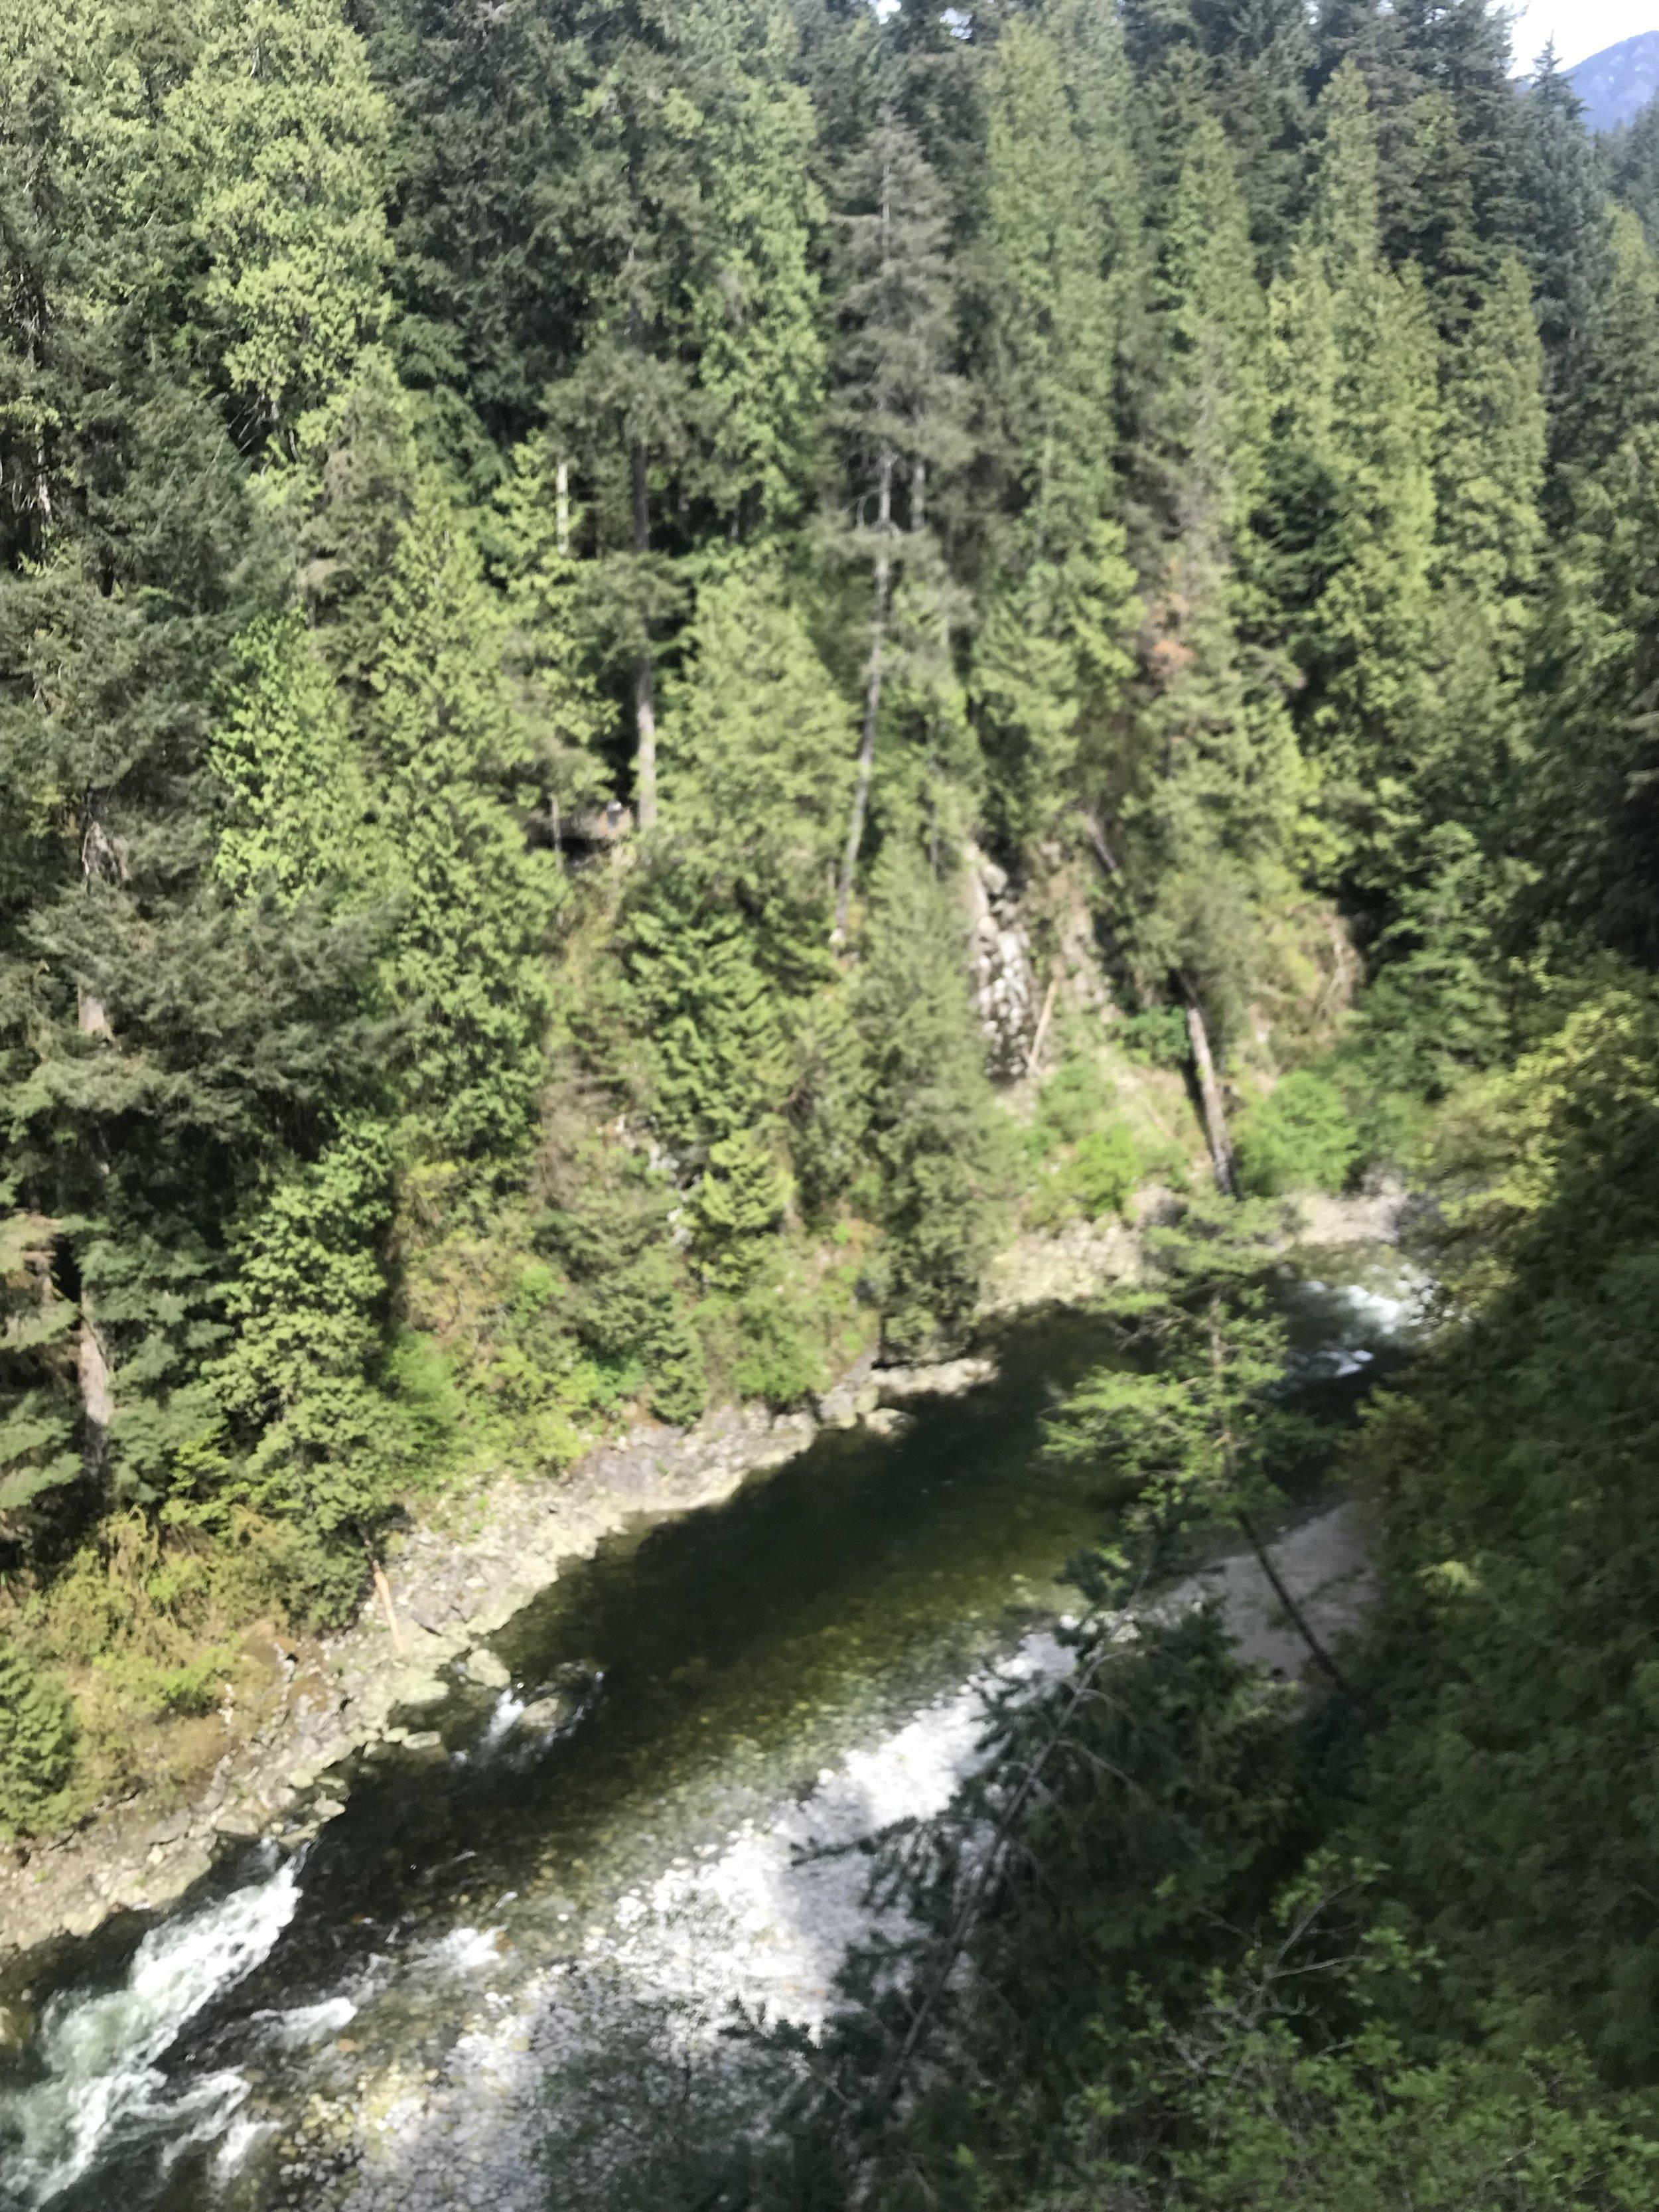 The Capilano River below.